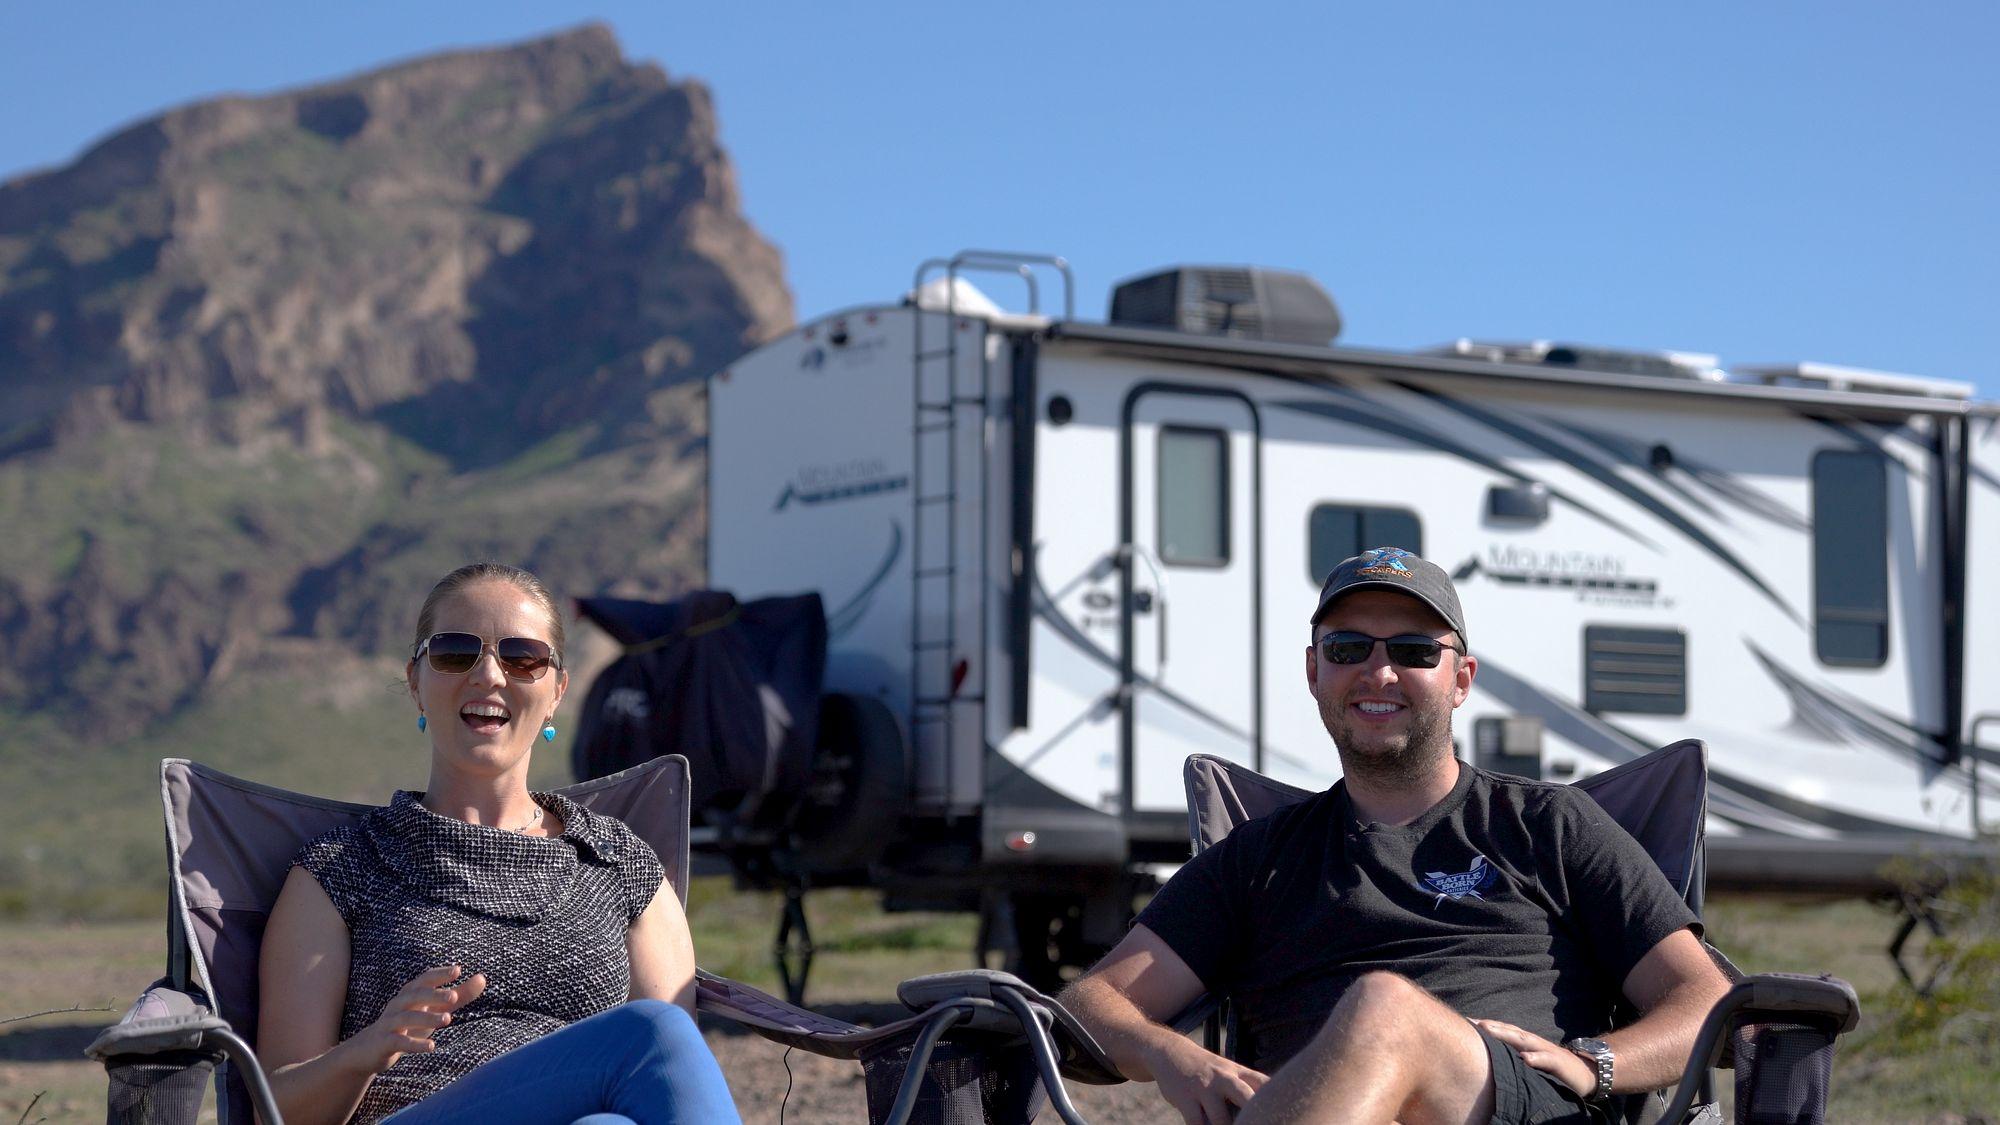 Season 3: National Park Adventure